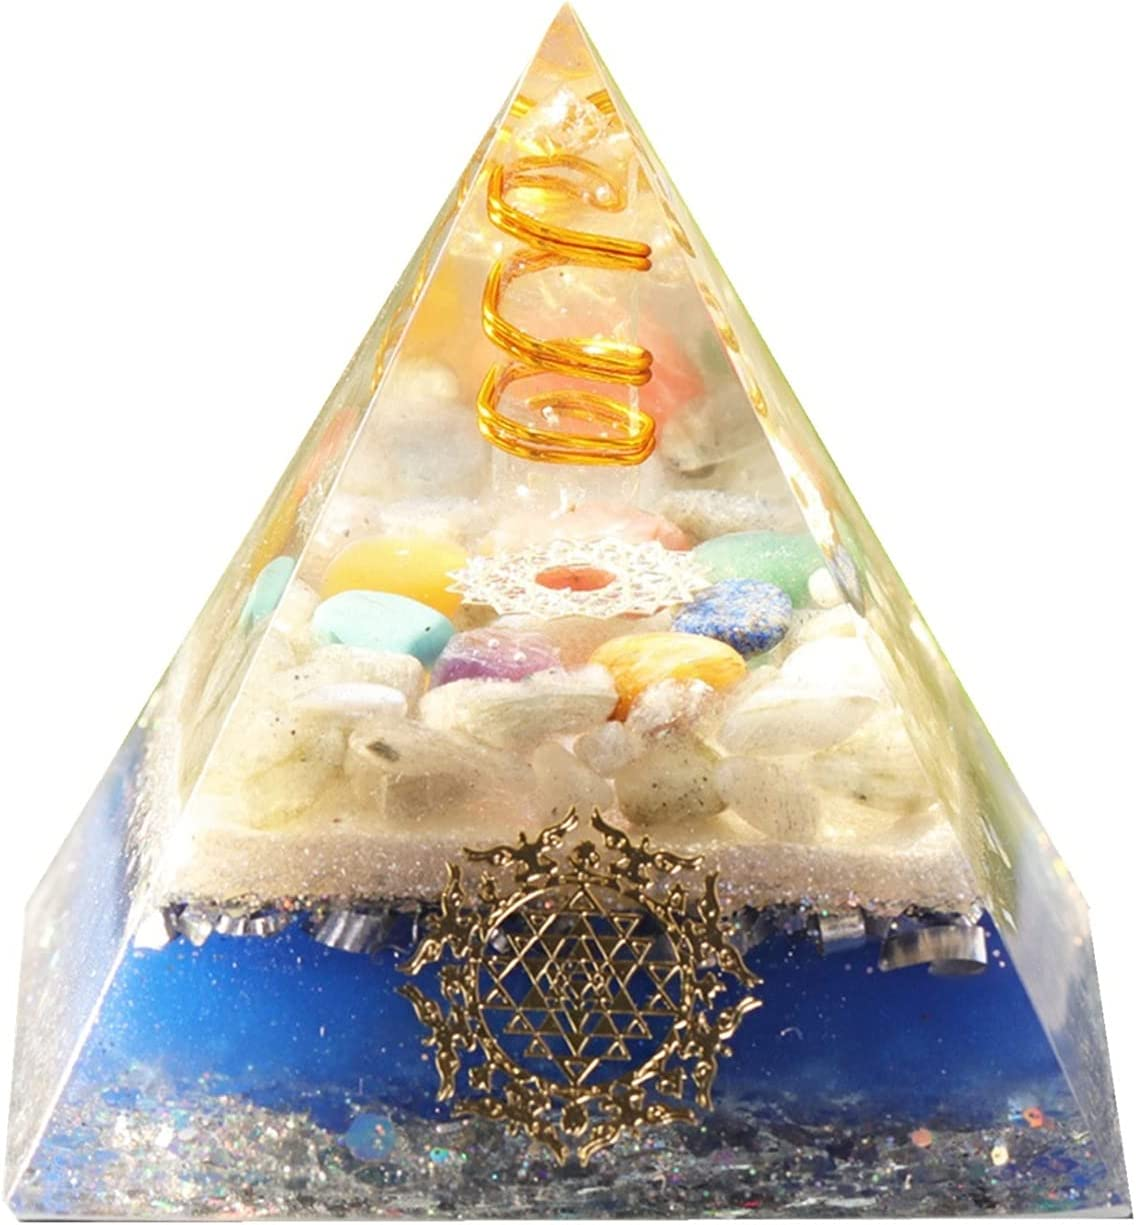 Las Vegas Mall AJULING 7 Chakra Max 85% OFF Crystal Stones Or Energy Orgone Pyramid Healing